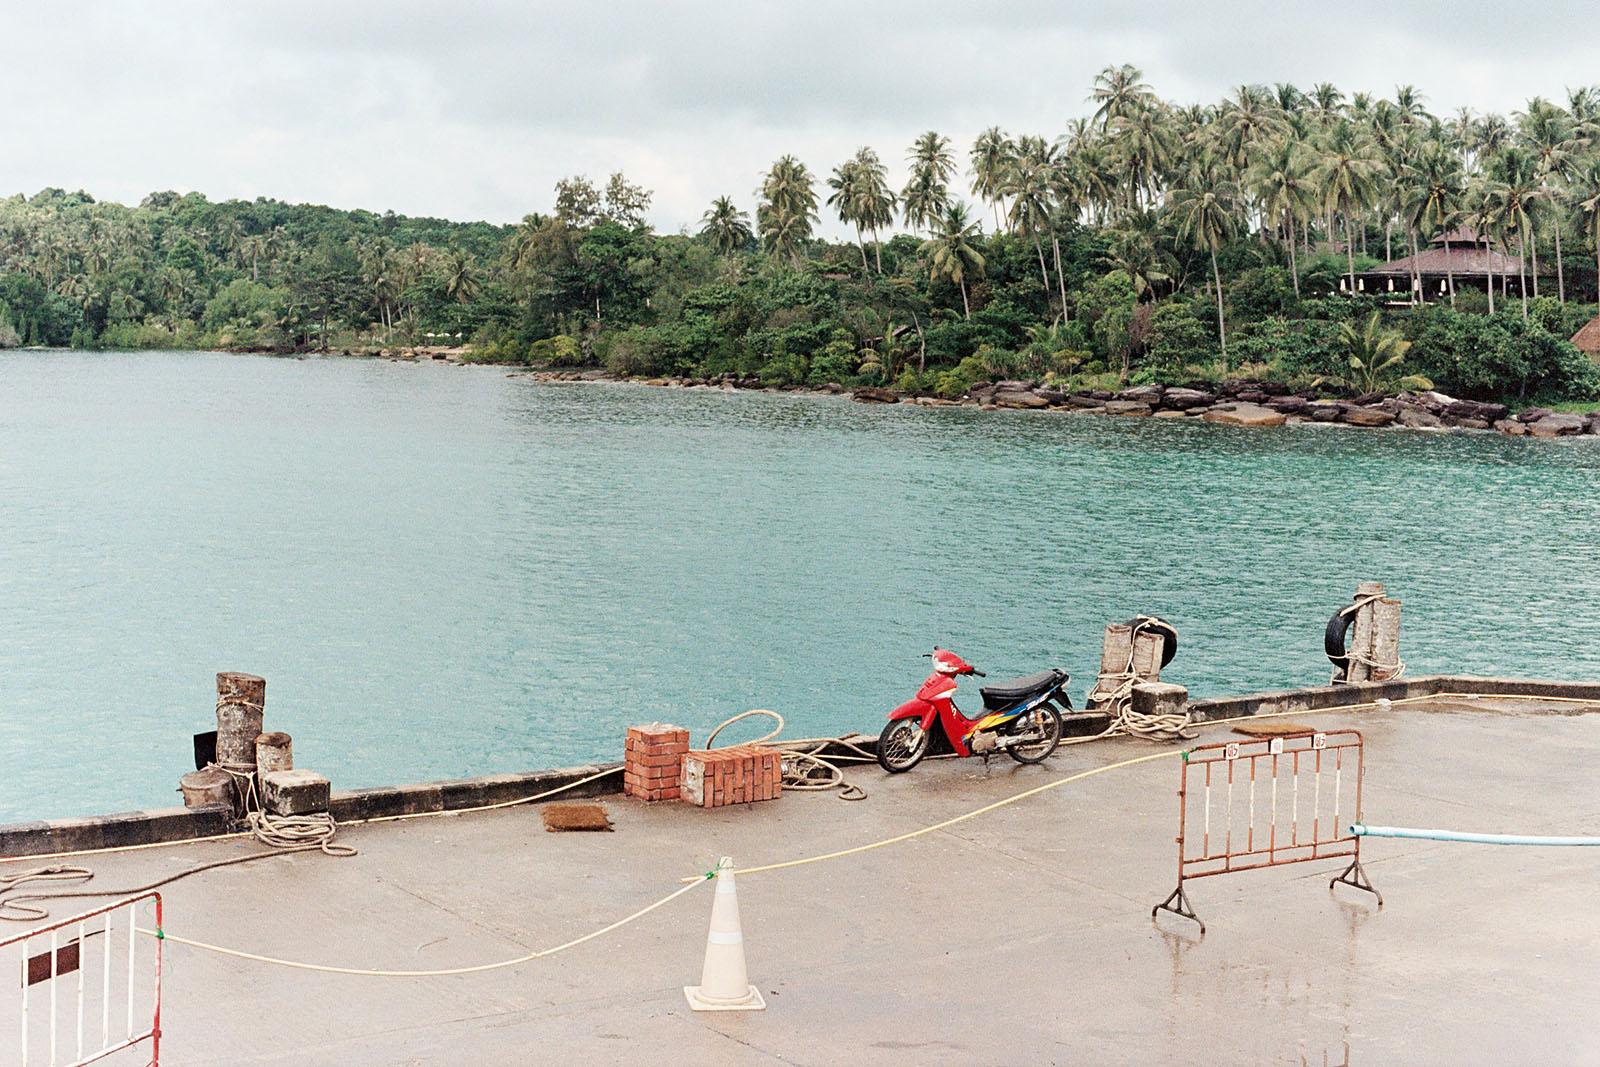 Ferry ride through the Gulf of Thailand | Thailand Travel Photos